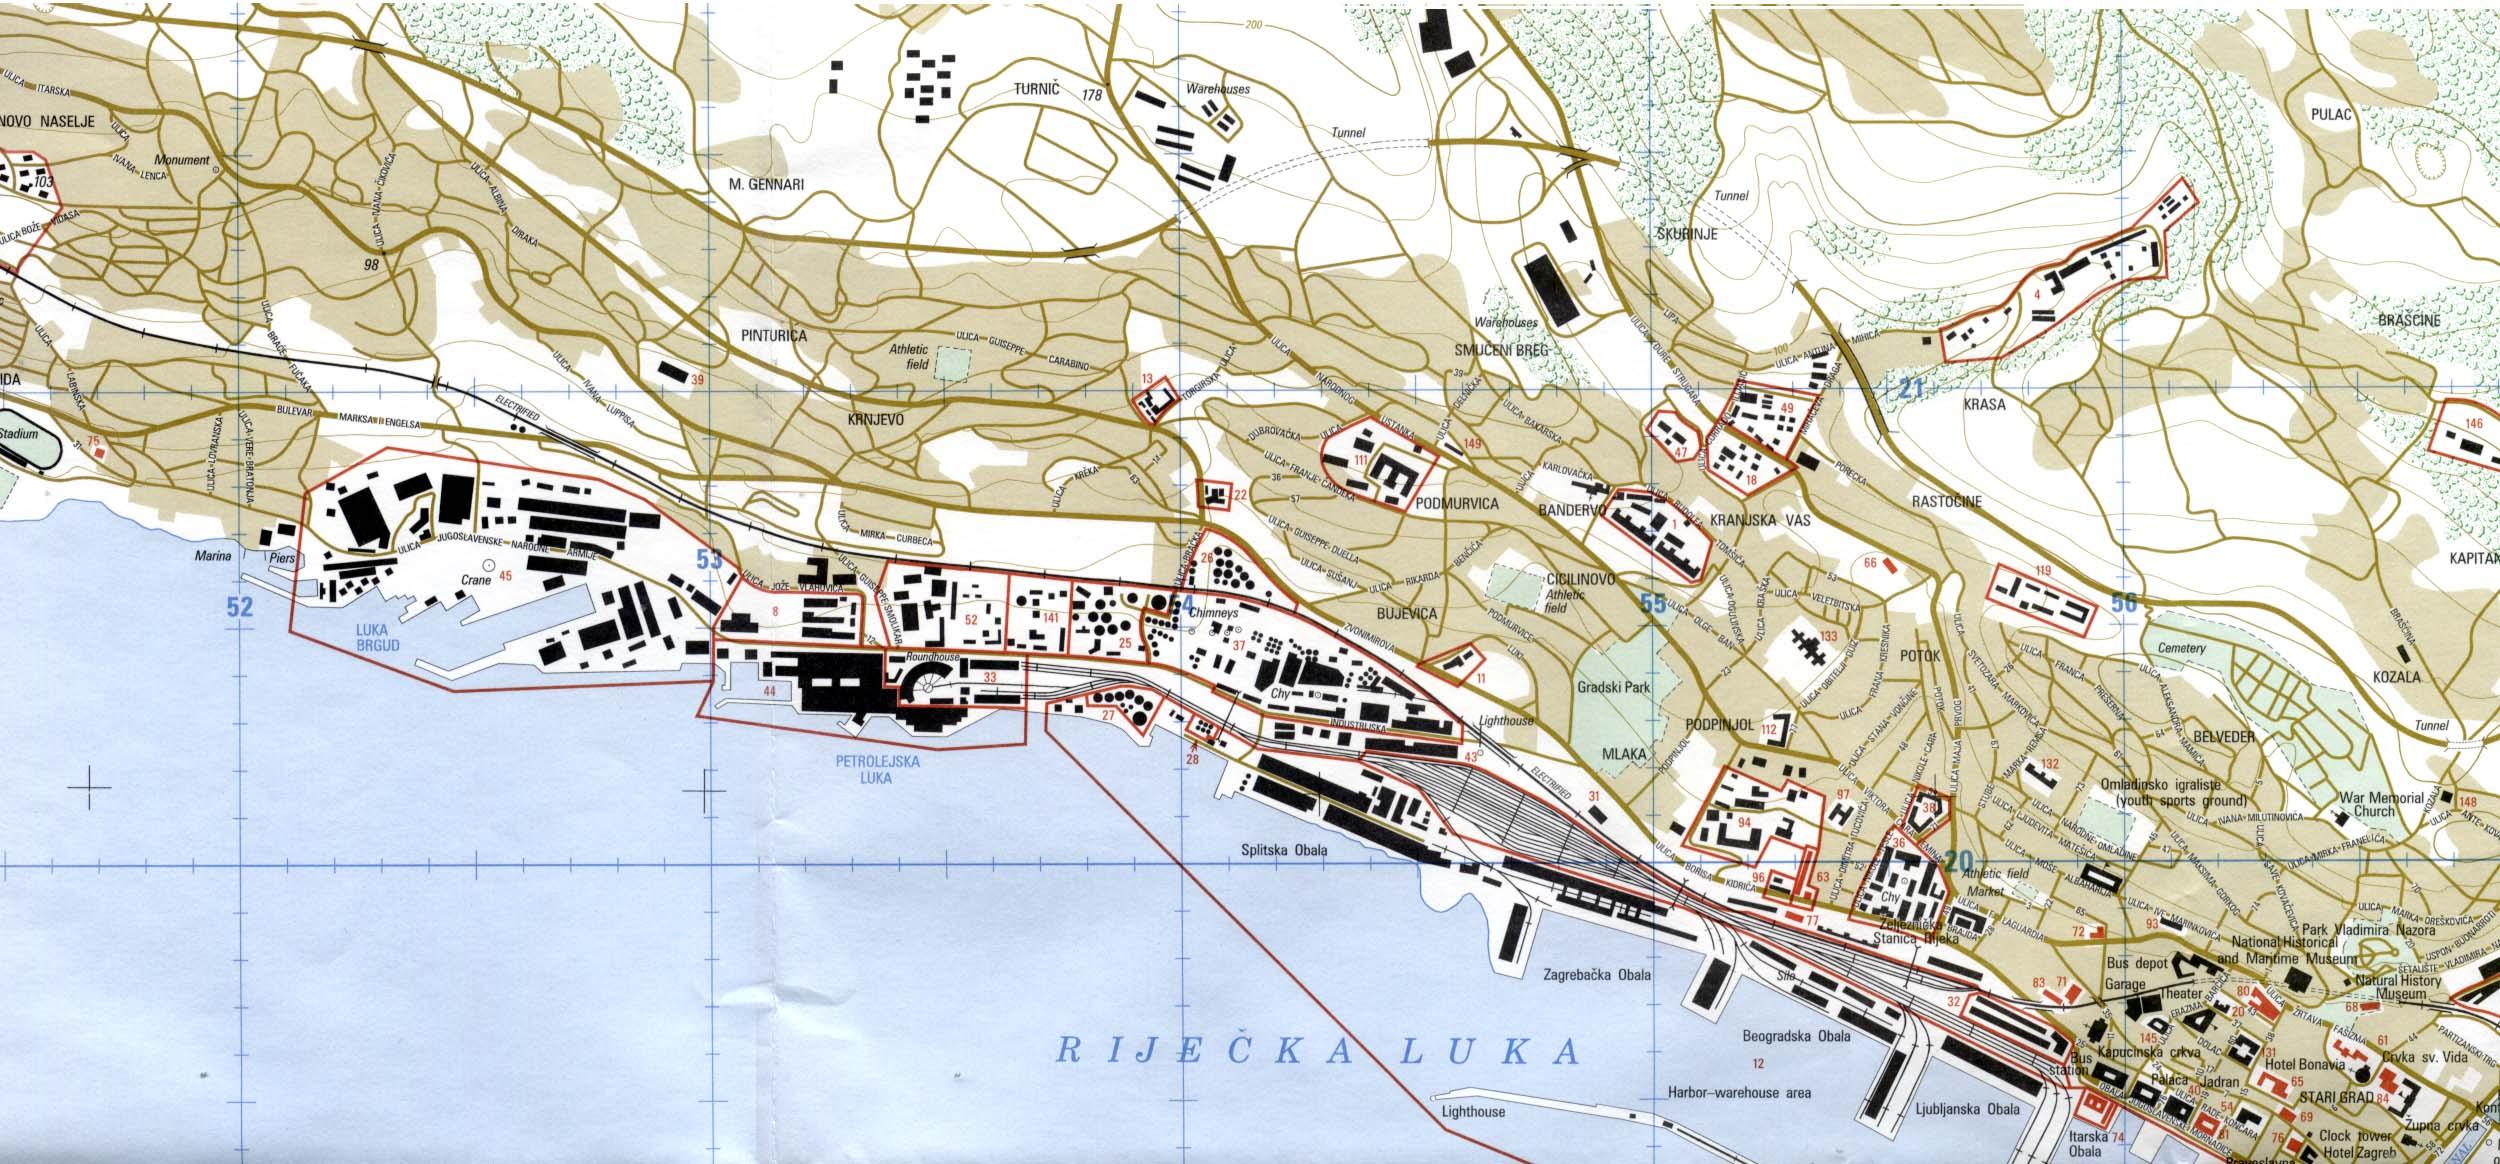 Rijeka City Map, Croatia